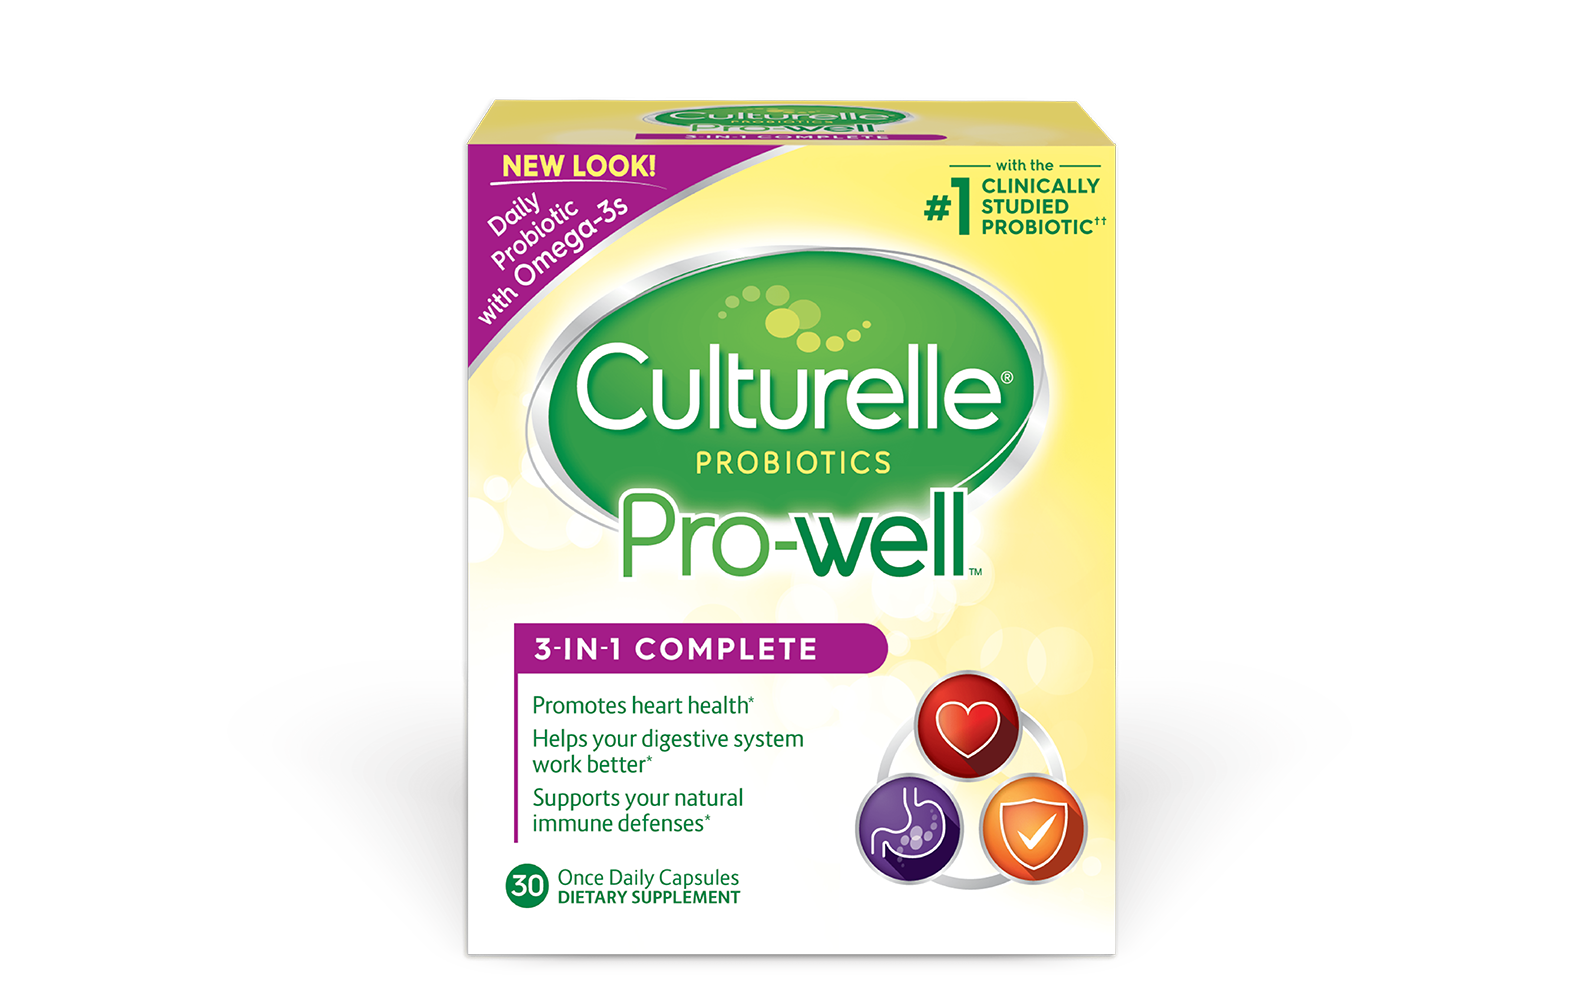 Culturelle® Probiotics Pro-Well® 3-in-1 Complete